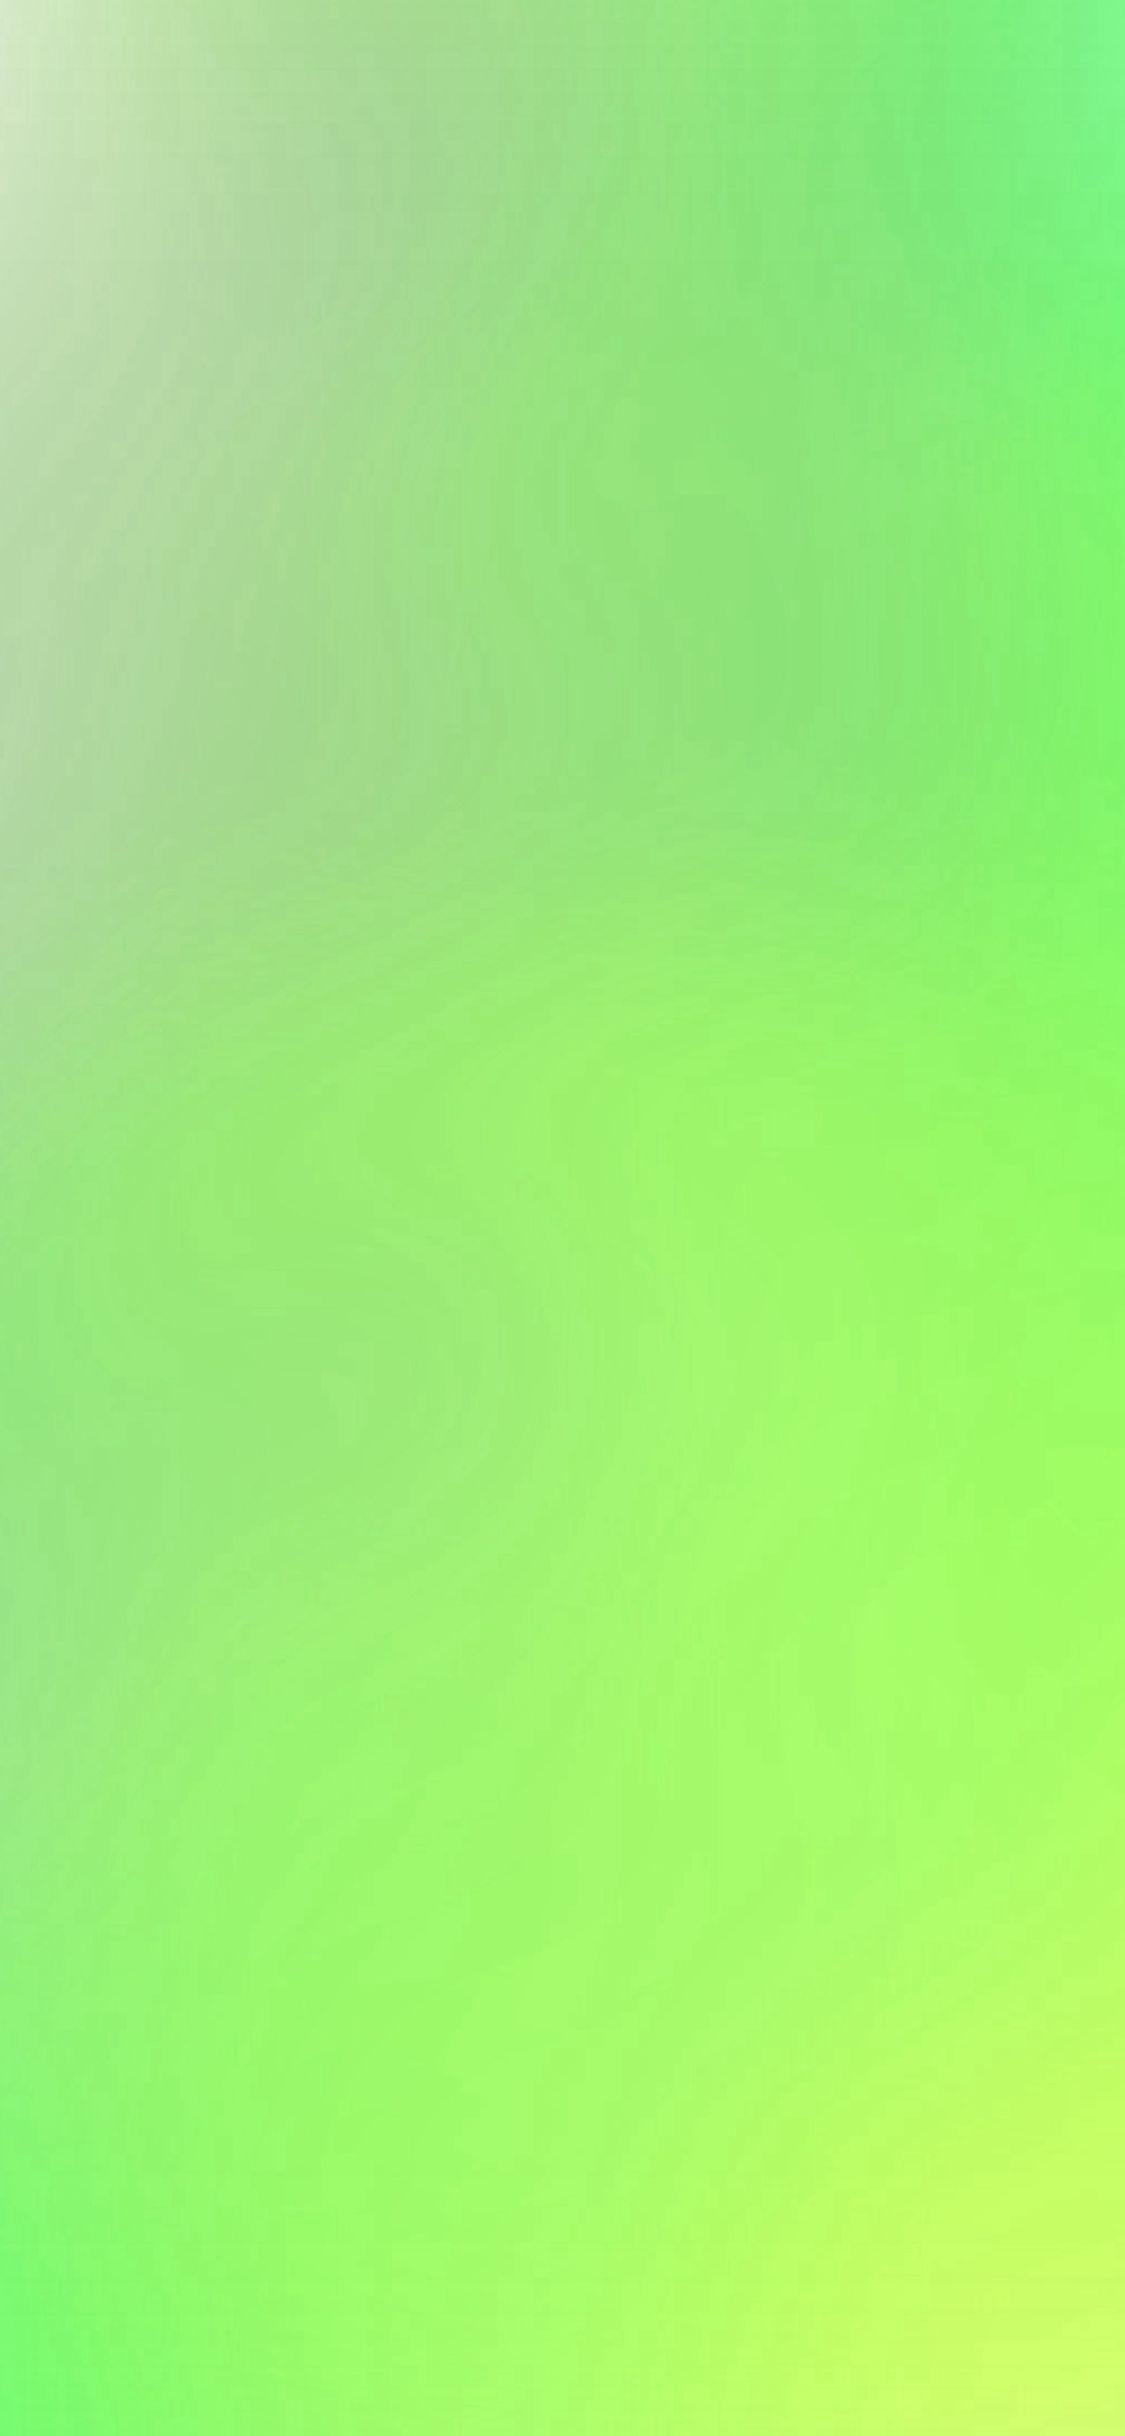 Green Yellow Blur Gradation #iPhone #X #wallpaper | iPhone X Wallpapers | Paint colors, Matching ...